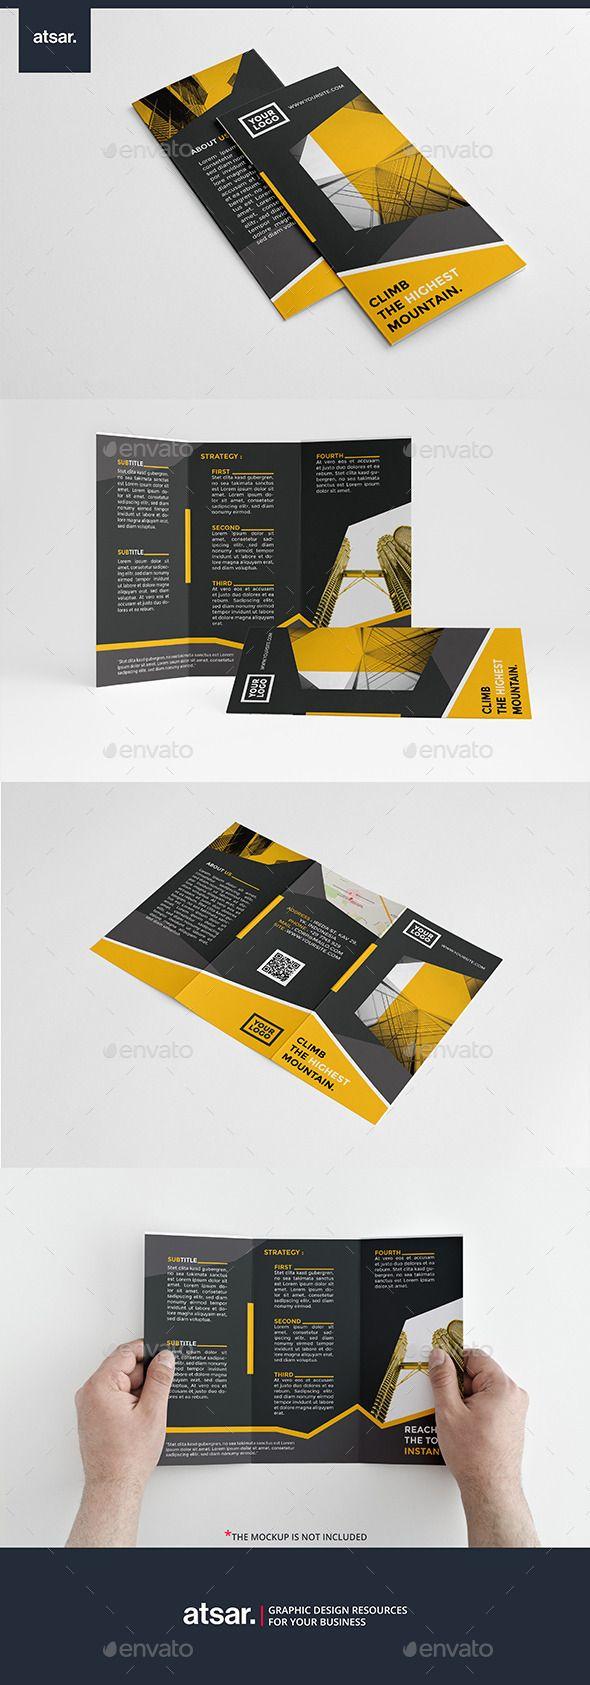 Modern Yellow Trifold Brochure Template #design #broschüre Download: http://graphicriver.net/item/modern-yellow-trifold/12360750?ref=ksioks